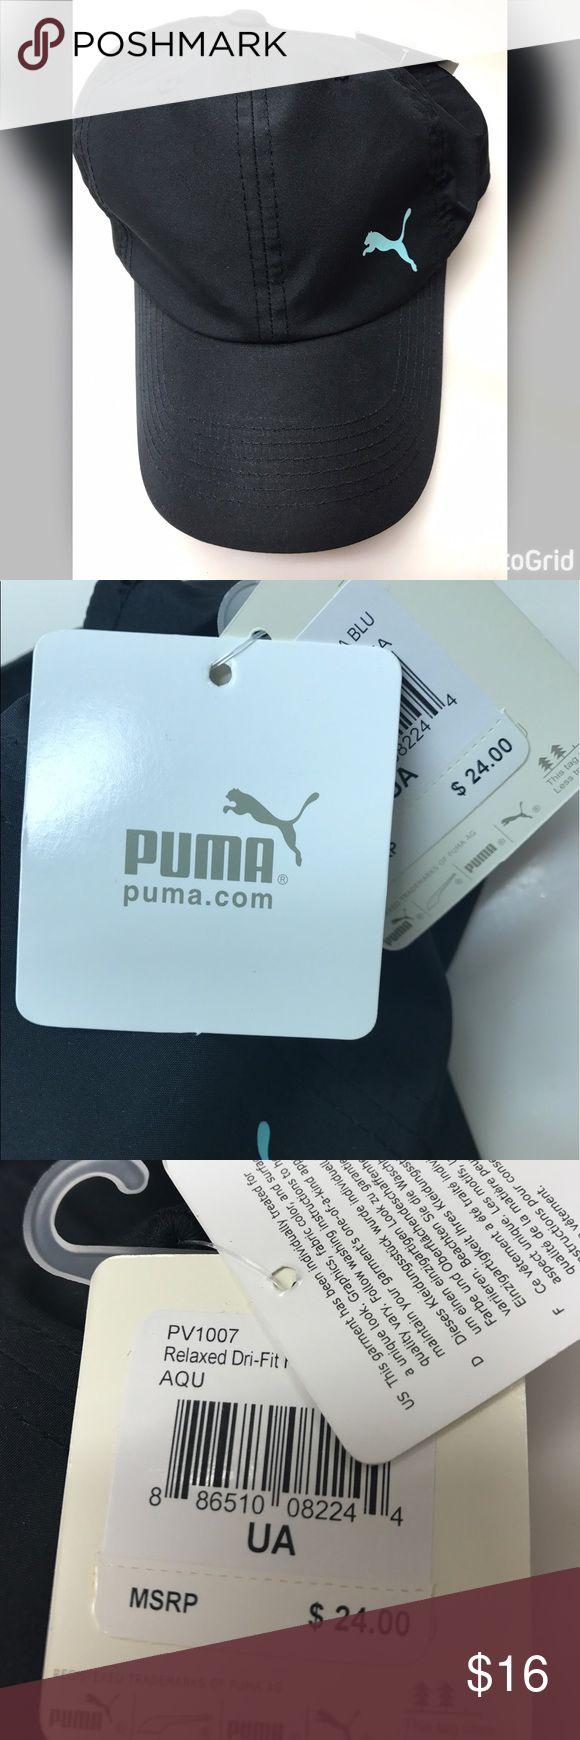 PUMA baseball cap with light blue puma emblem New with tags Puma Accessories Hats